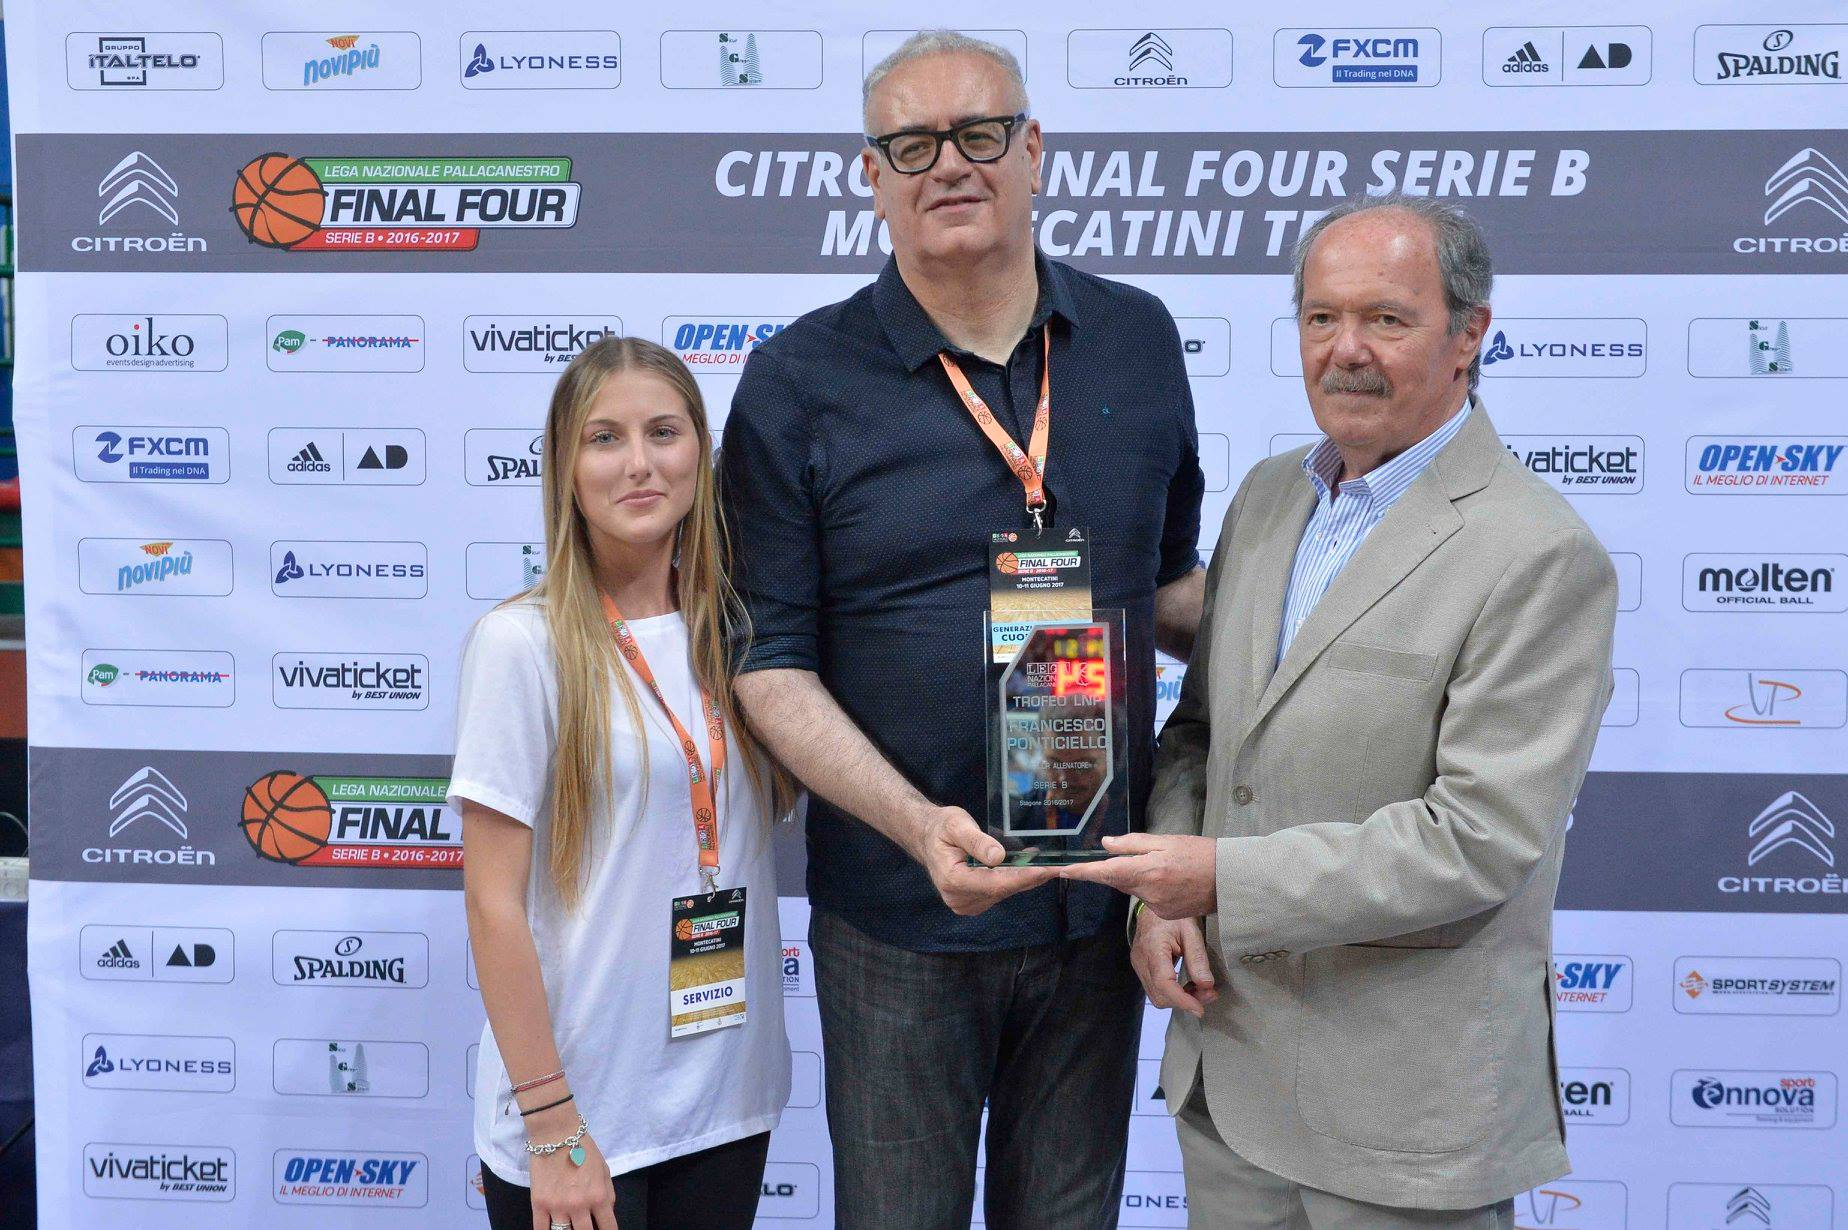 Serie B Old Wild West Mercato 2018-19: la Citysightseeing Palestrina riparte da Francesco Ponticiello in panchina